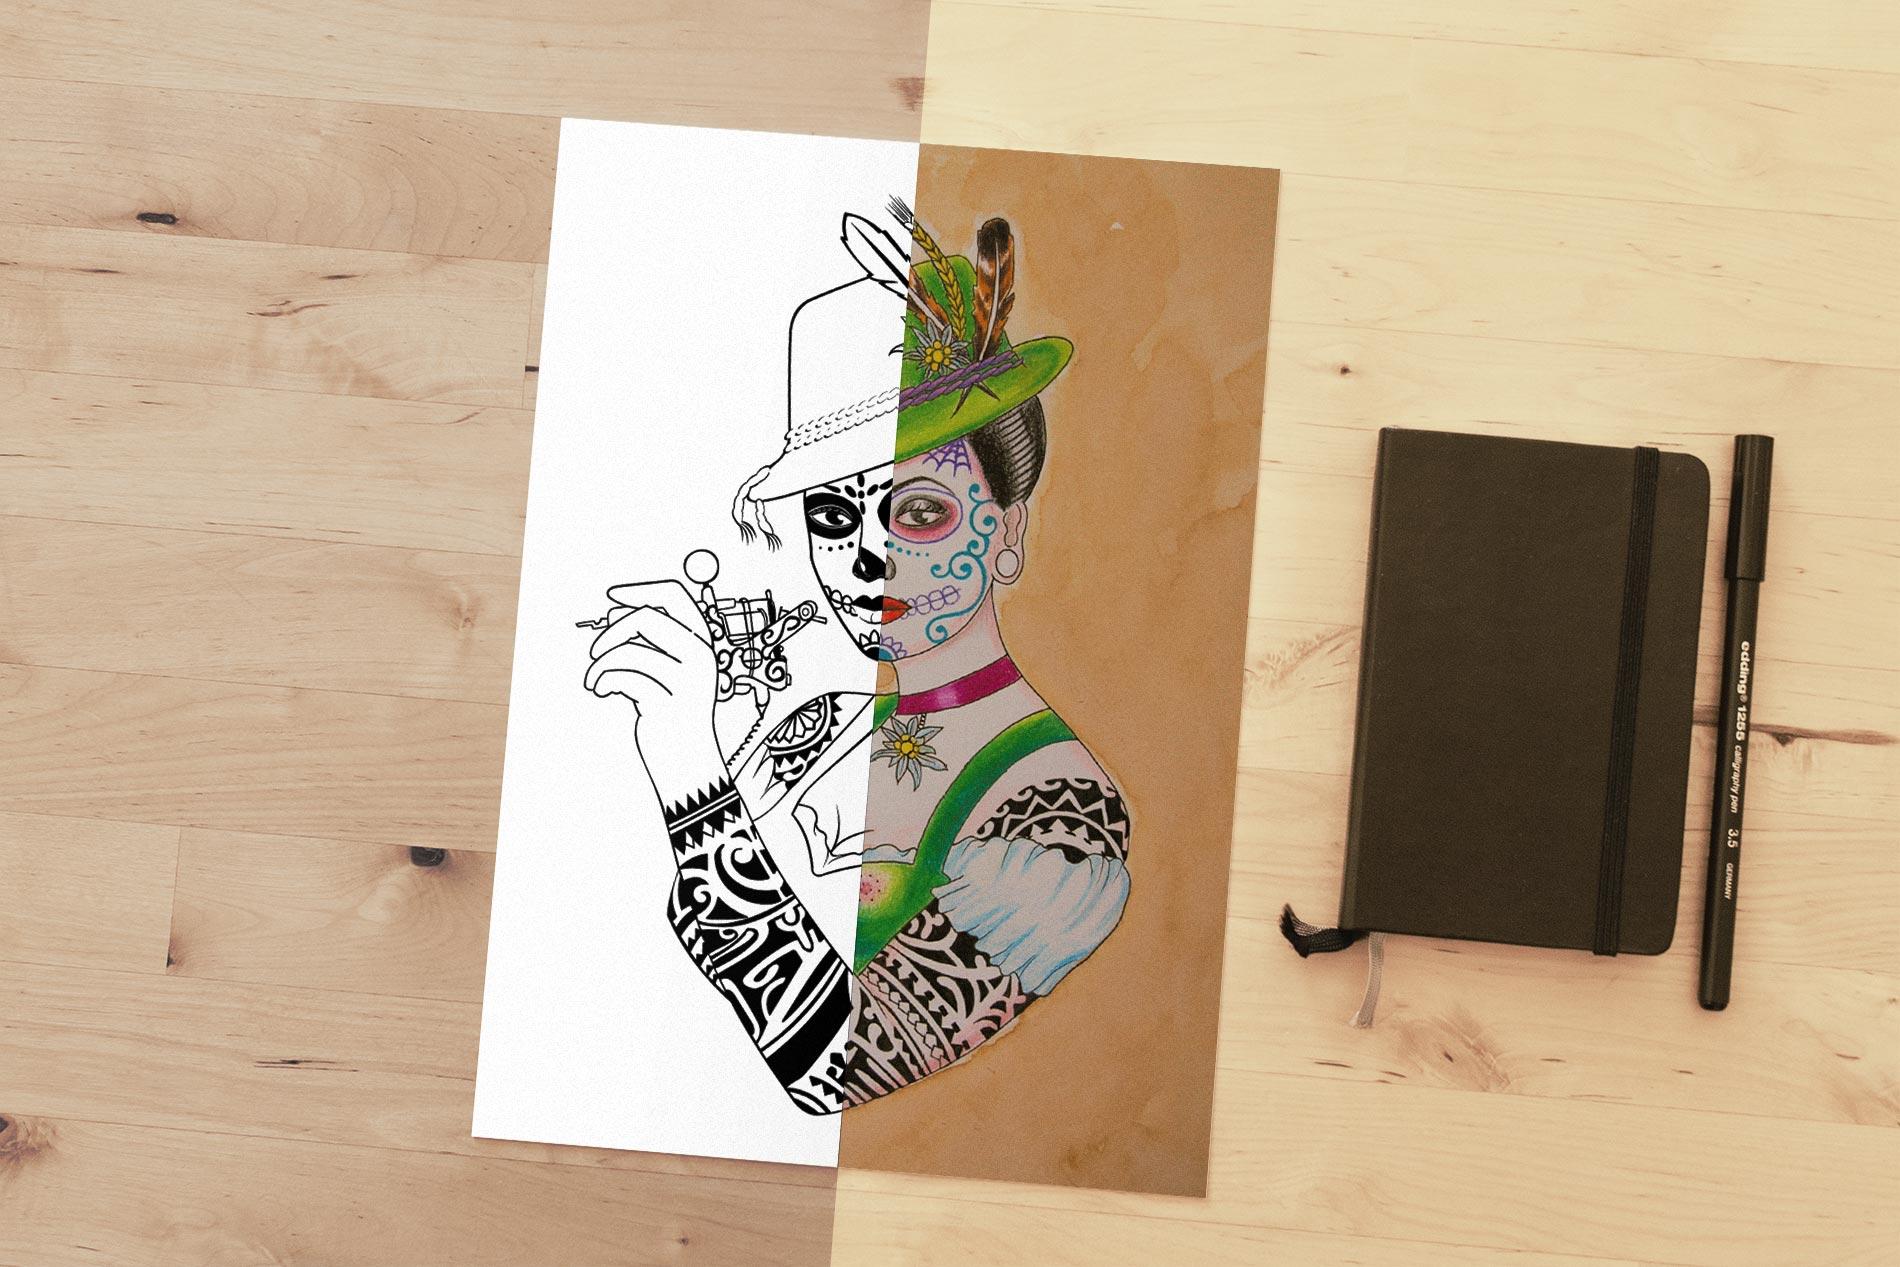 Voodoo Croo Logogestaltung Werbeagentur Rheinland Pfalz